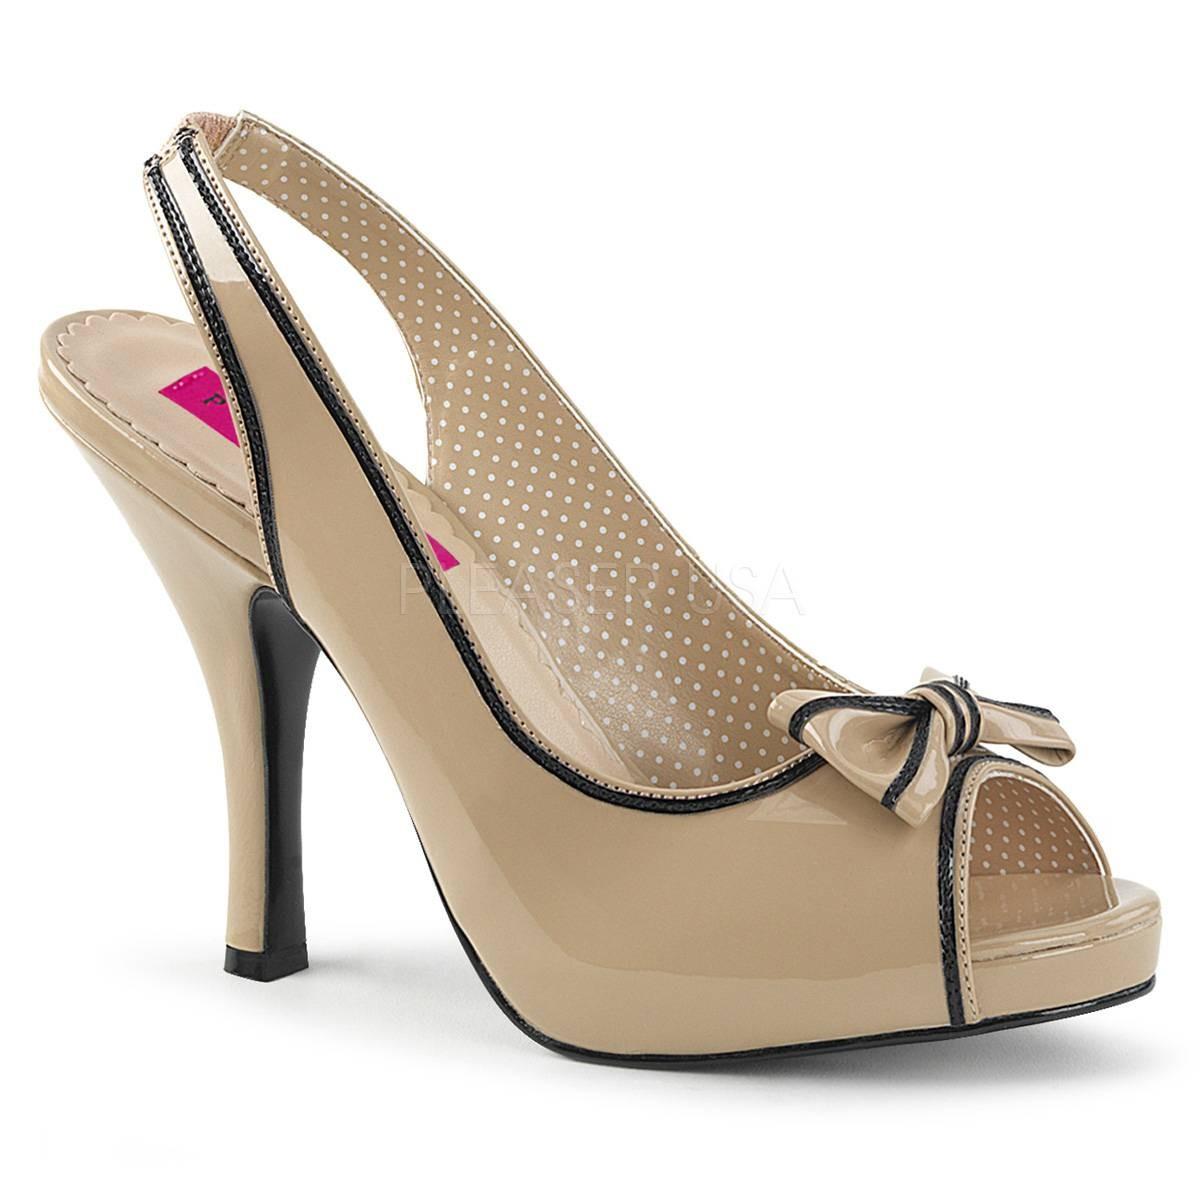 Sandalen - PINUP 10 ° Damen Peep Toe Sandalette ° BeigeGlänzend ° Pleaser Pink Label  - Onlineshop RedSixty